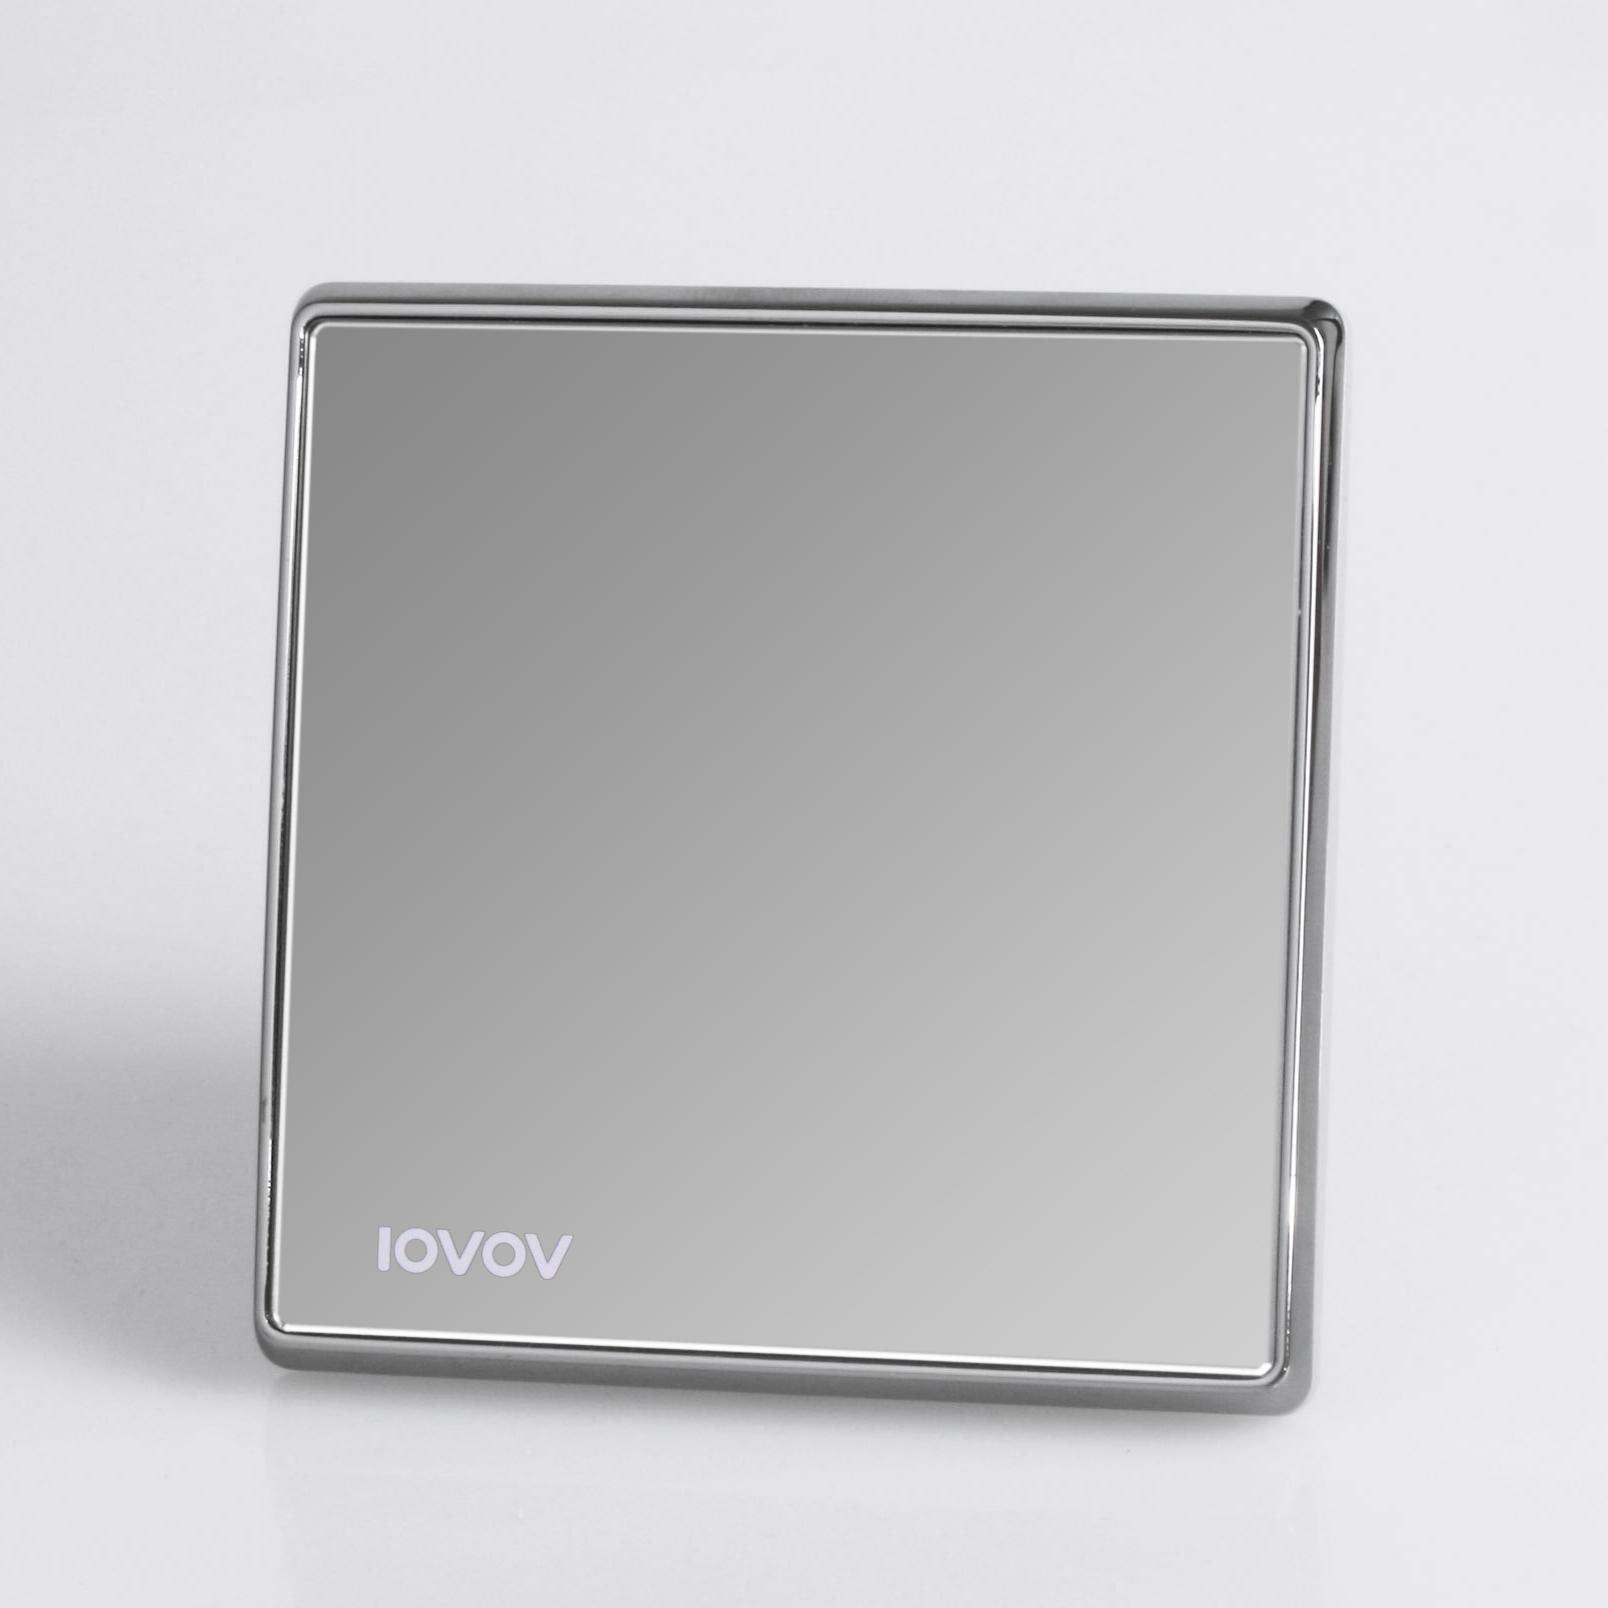 Wall x5 blank box panel black crystal mirror switch 86 quality personalized socket(China (Mainland))